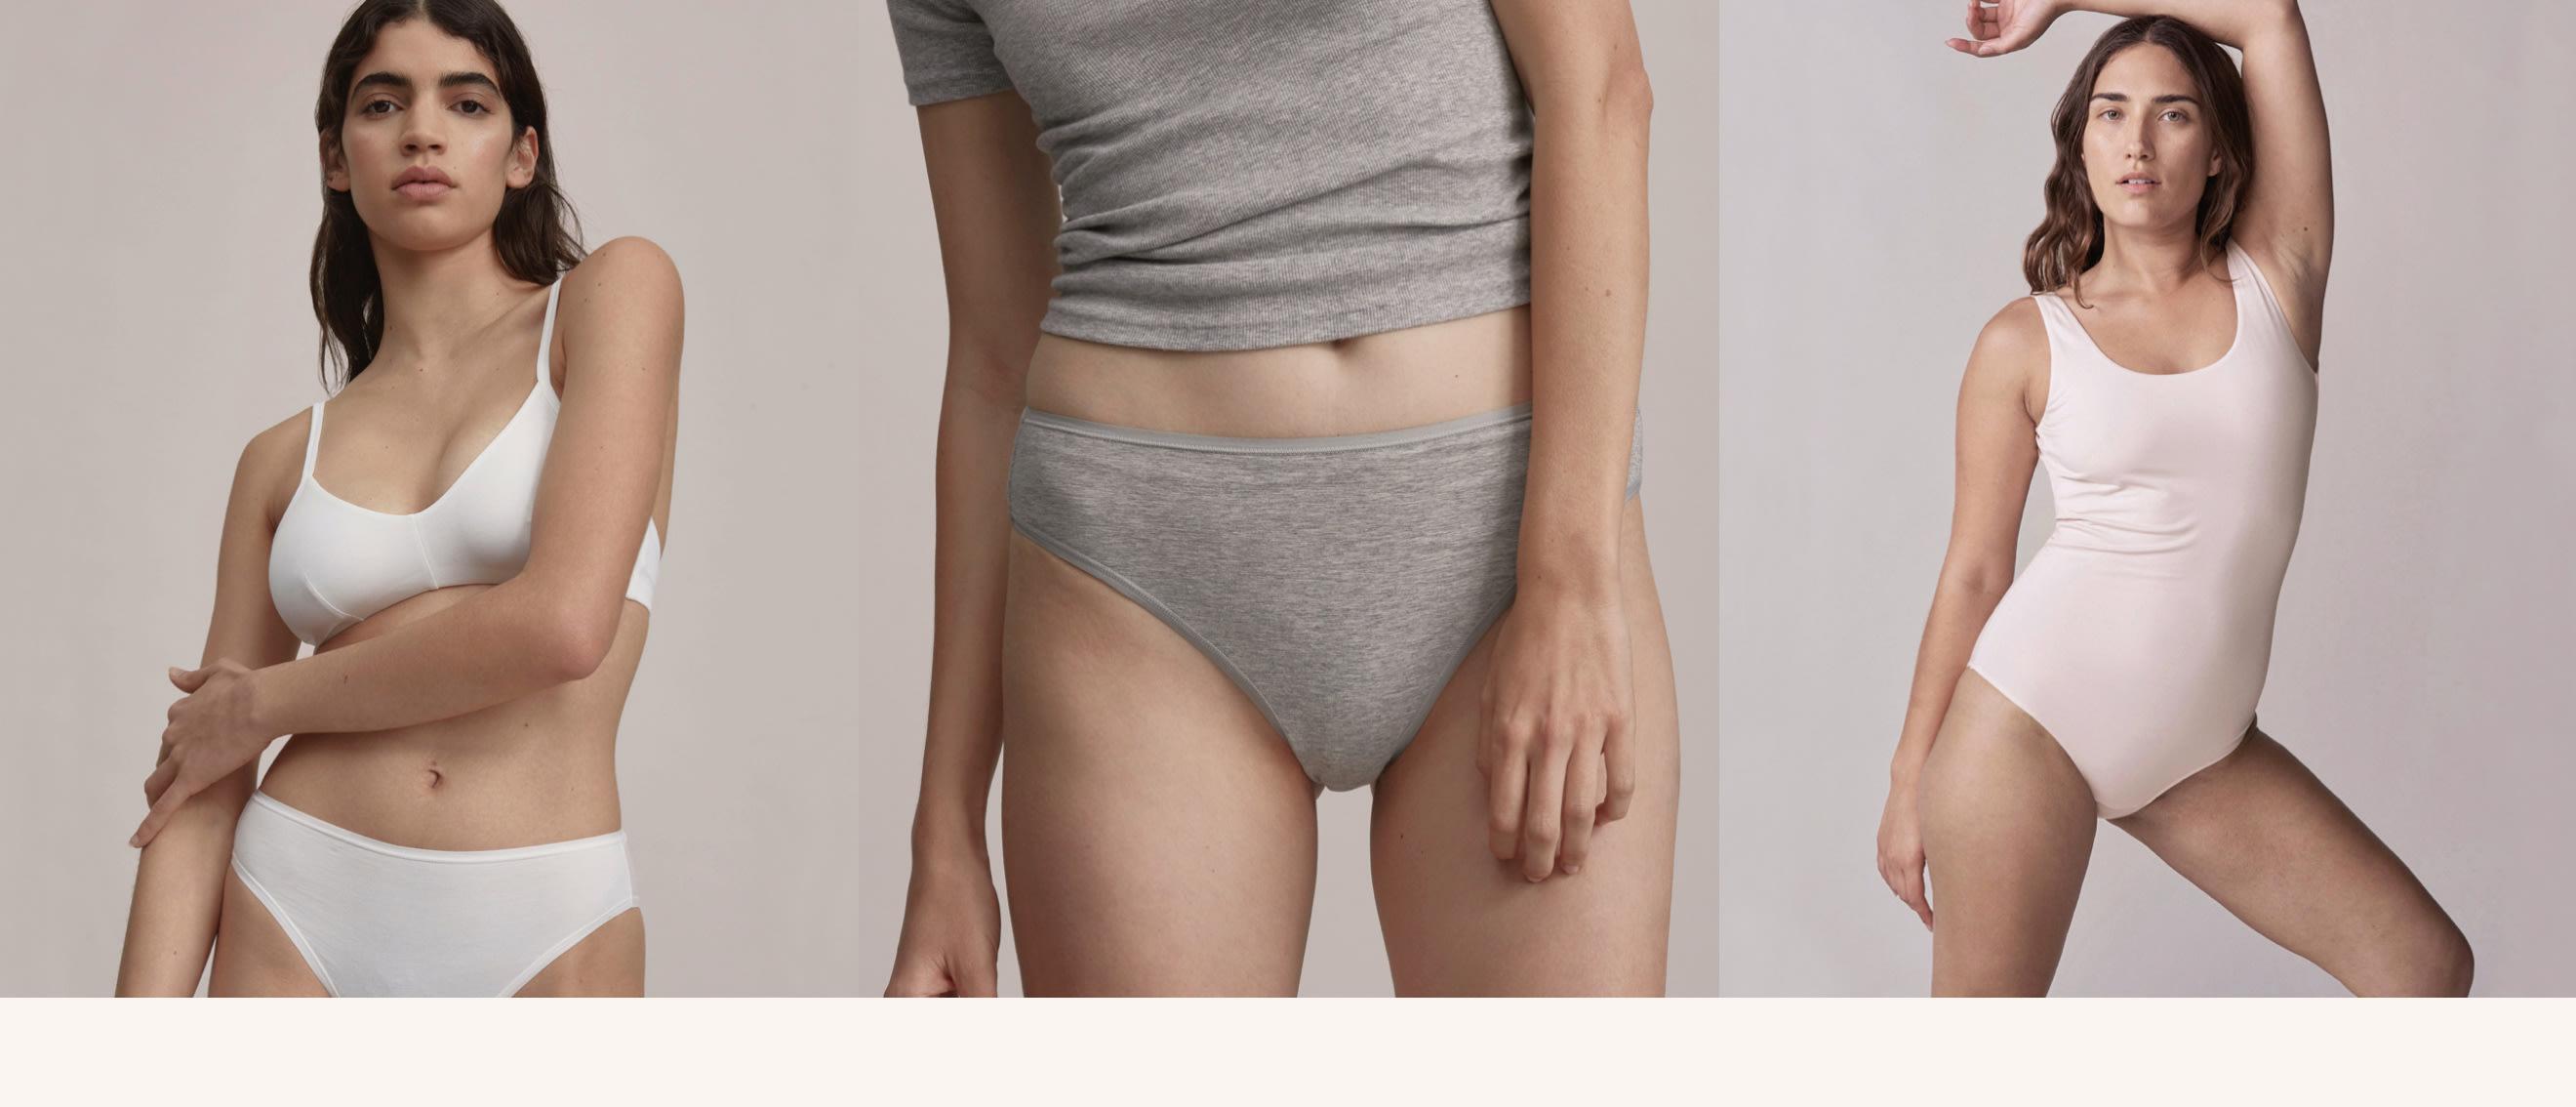 1ba1ffd8fd821b Shop Women's Underwear - Bras, Thongs, Hipsters & More | Everlane